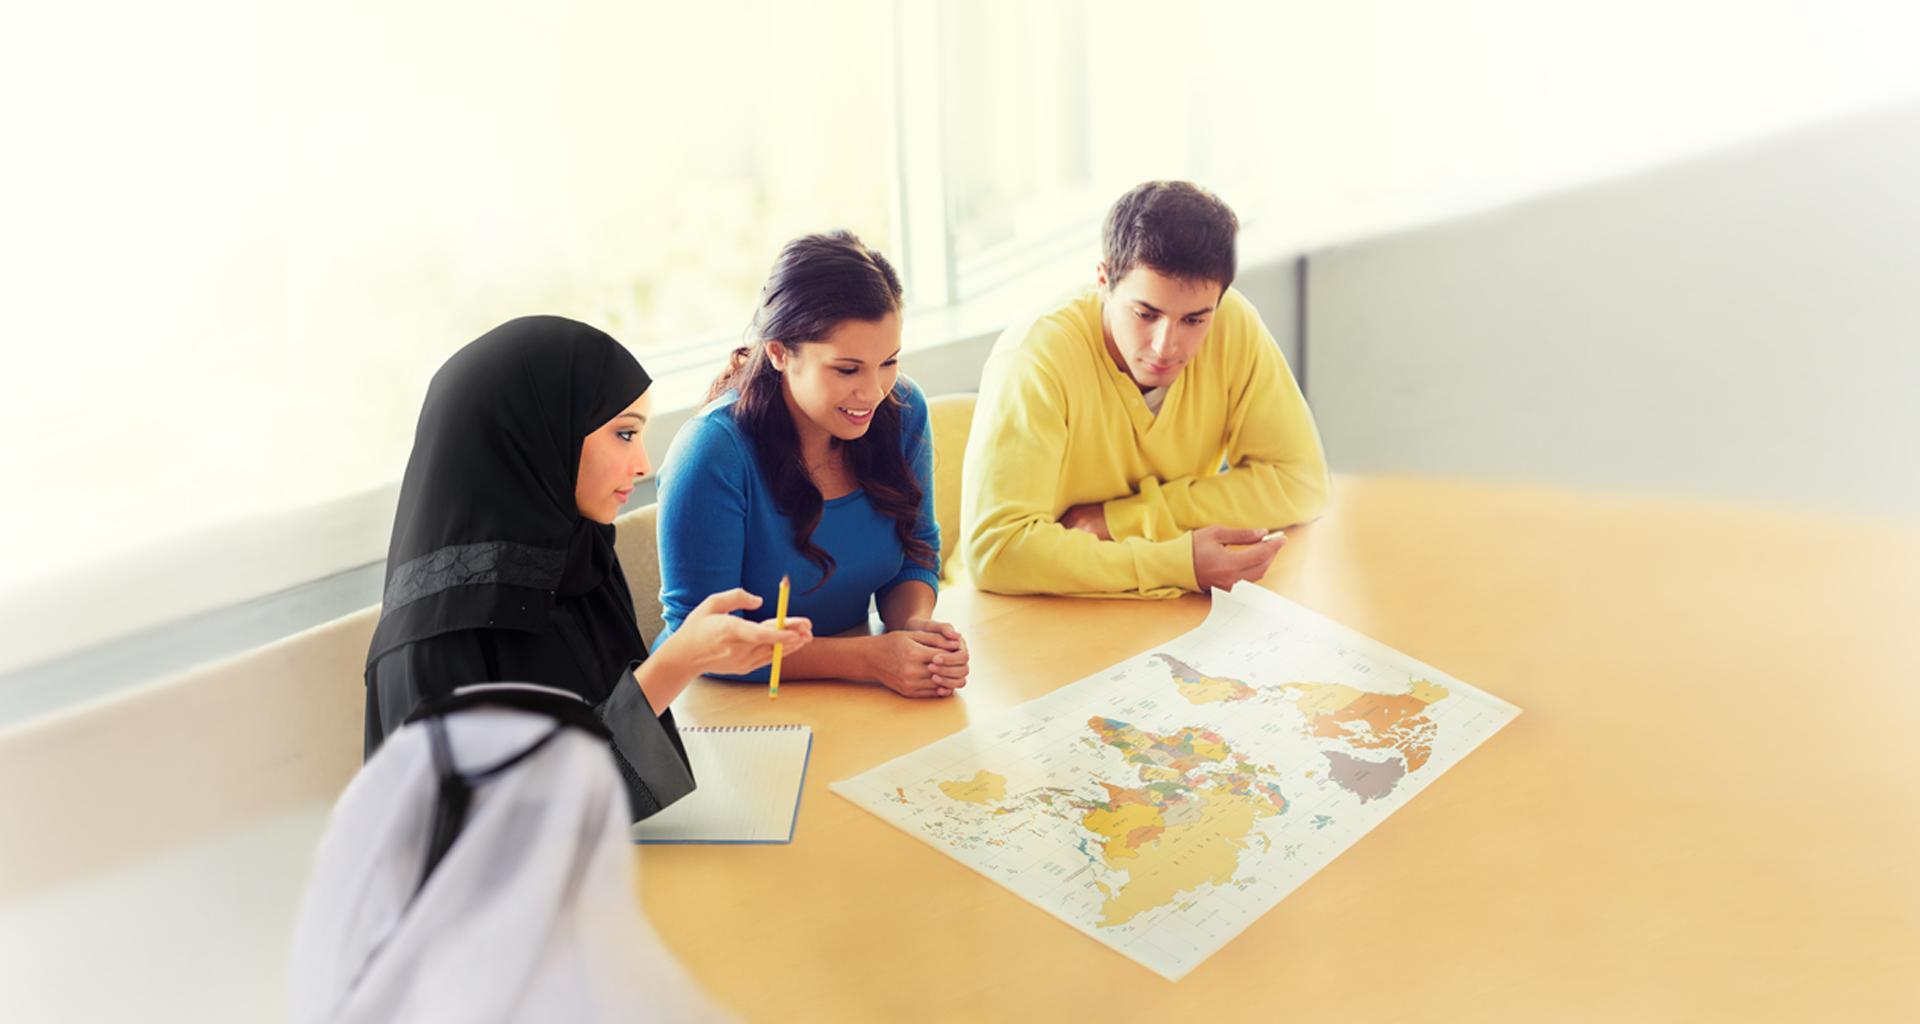 Gain New Knowledge of Islam and Global Affairs